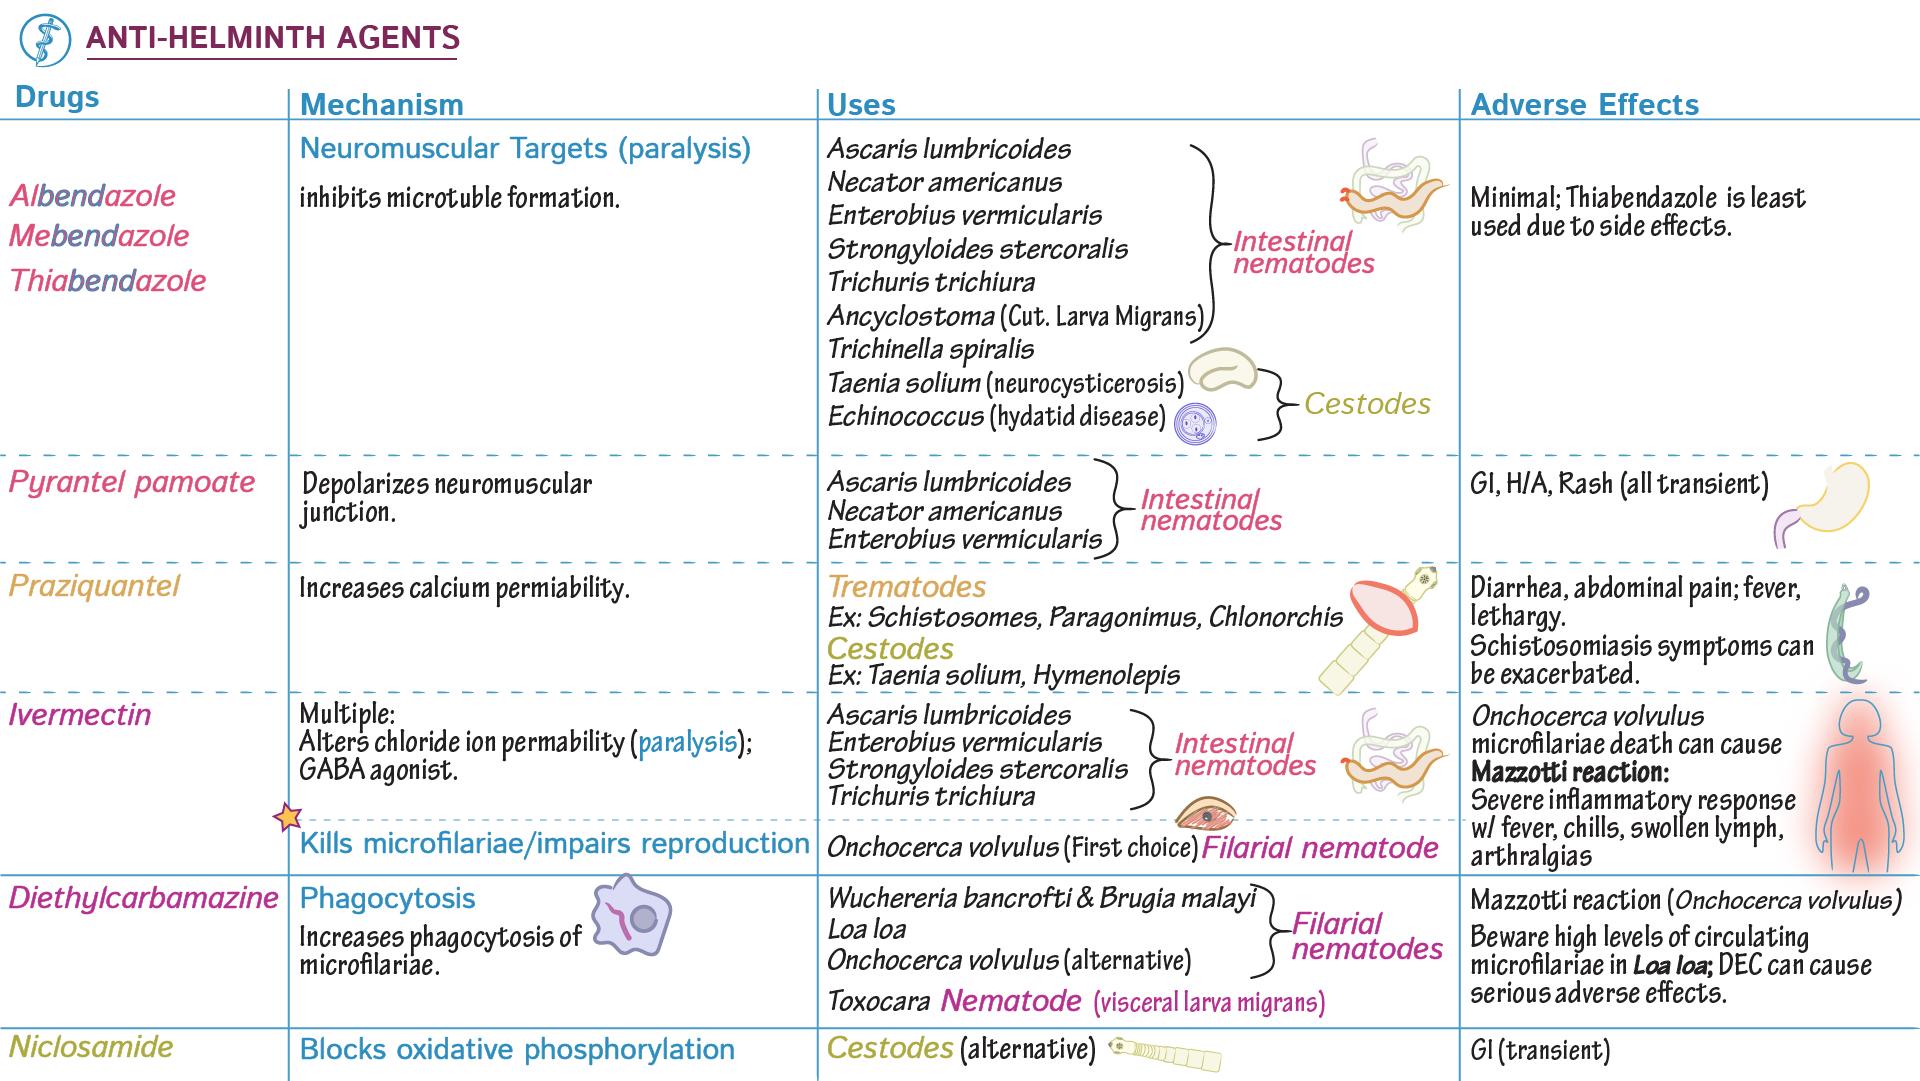 Giardia usmle - Selective IgA Deficiency Mnemonic for USMLE az ascaris kórokozója